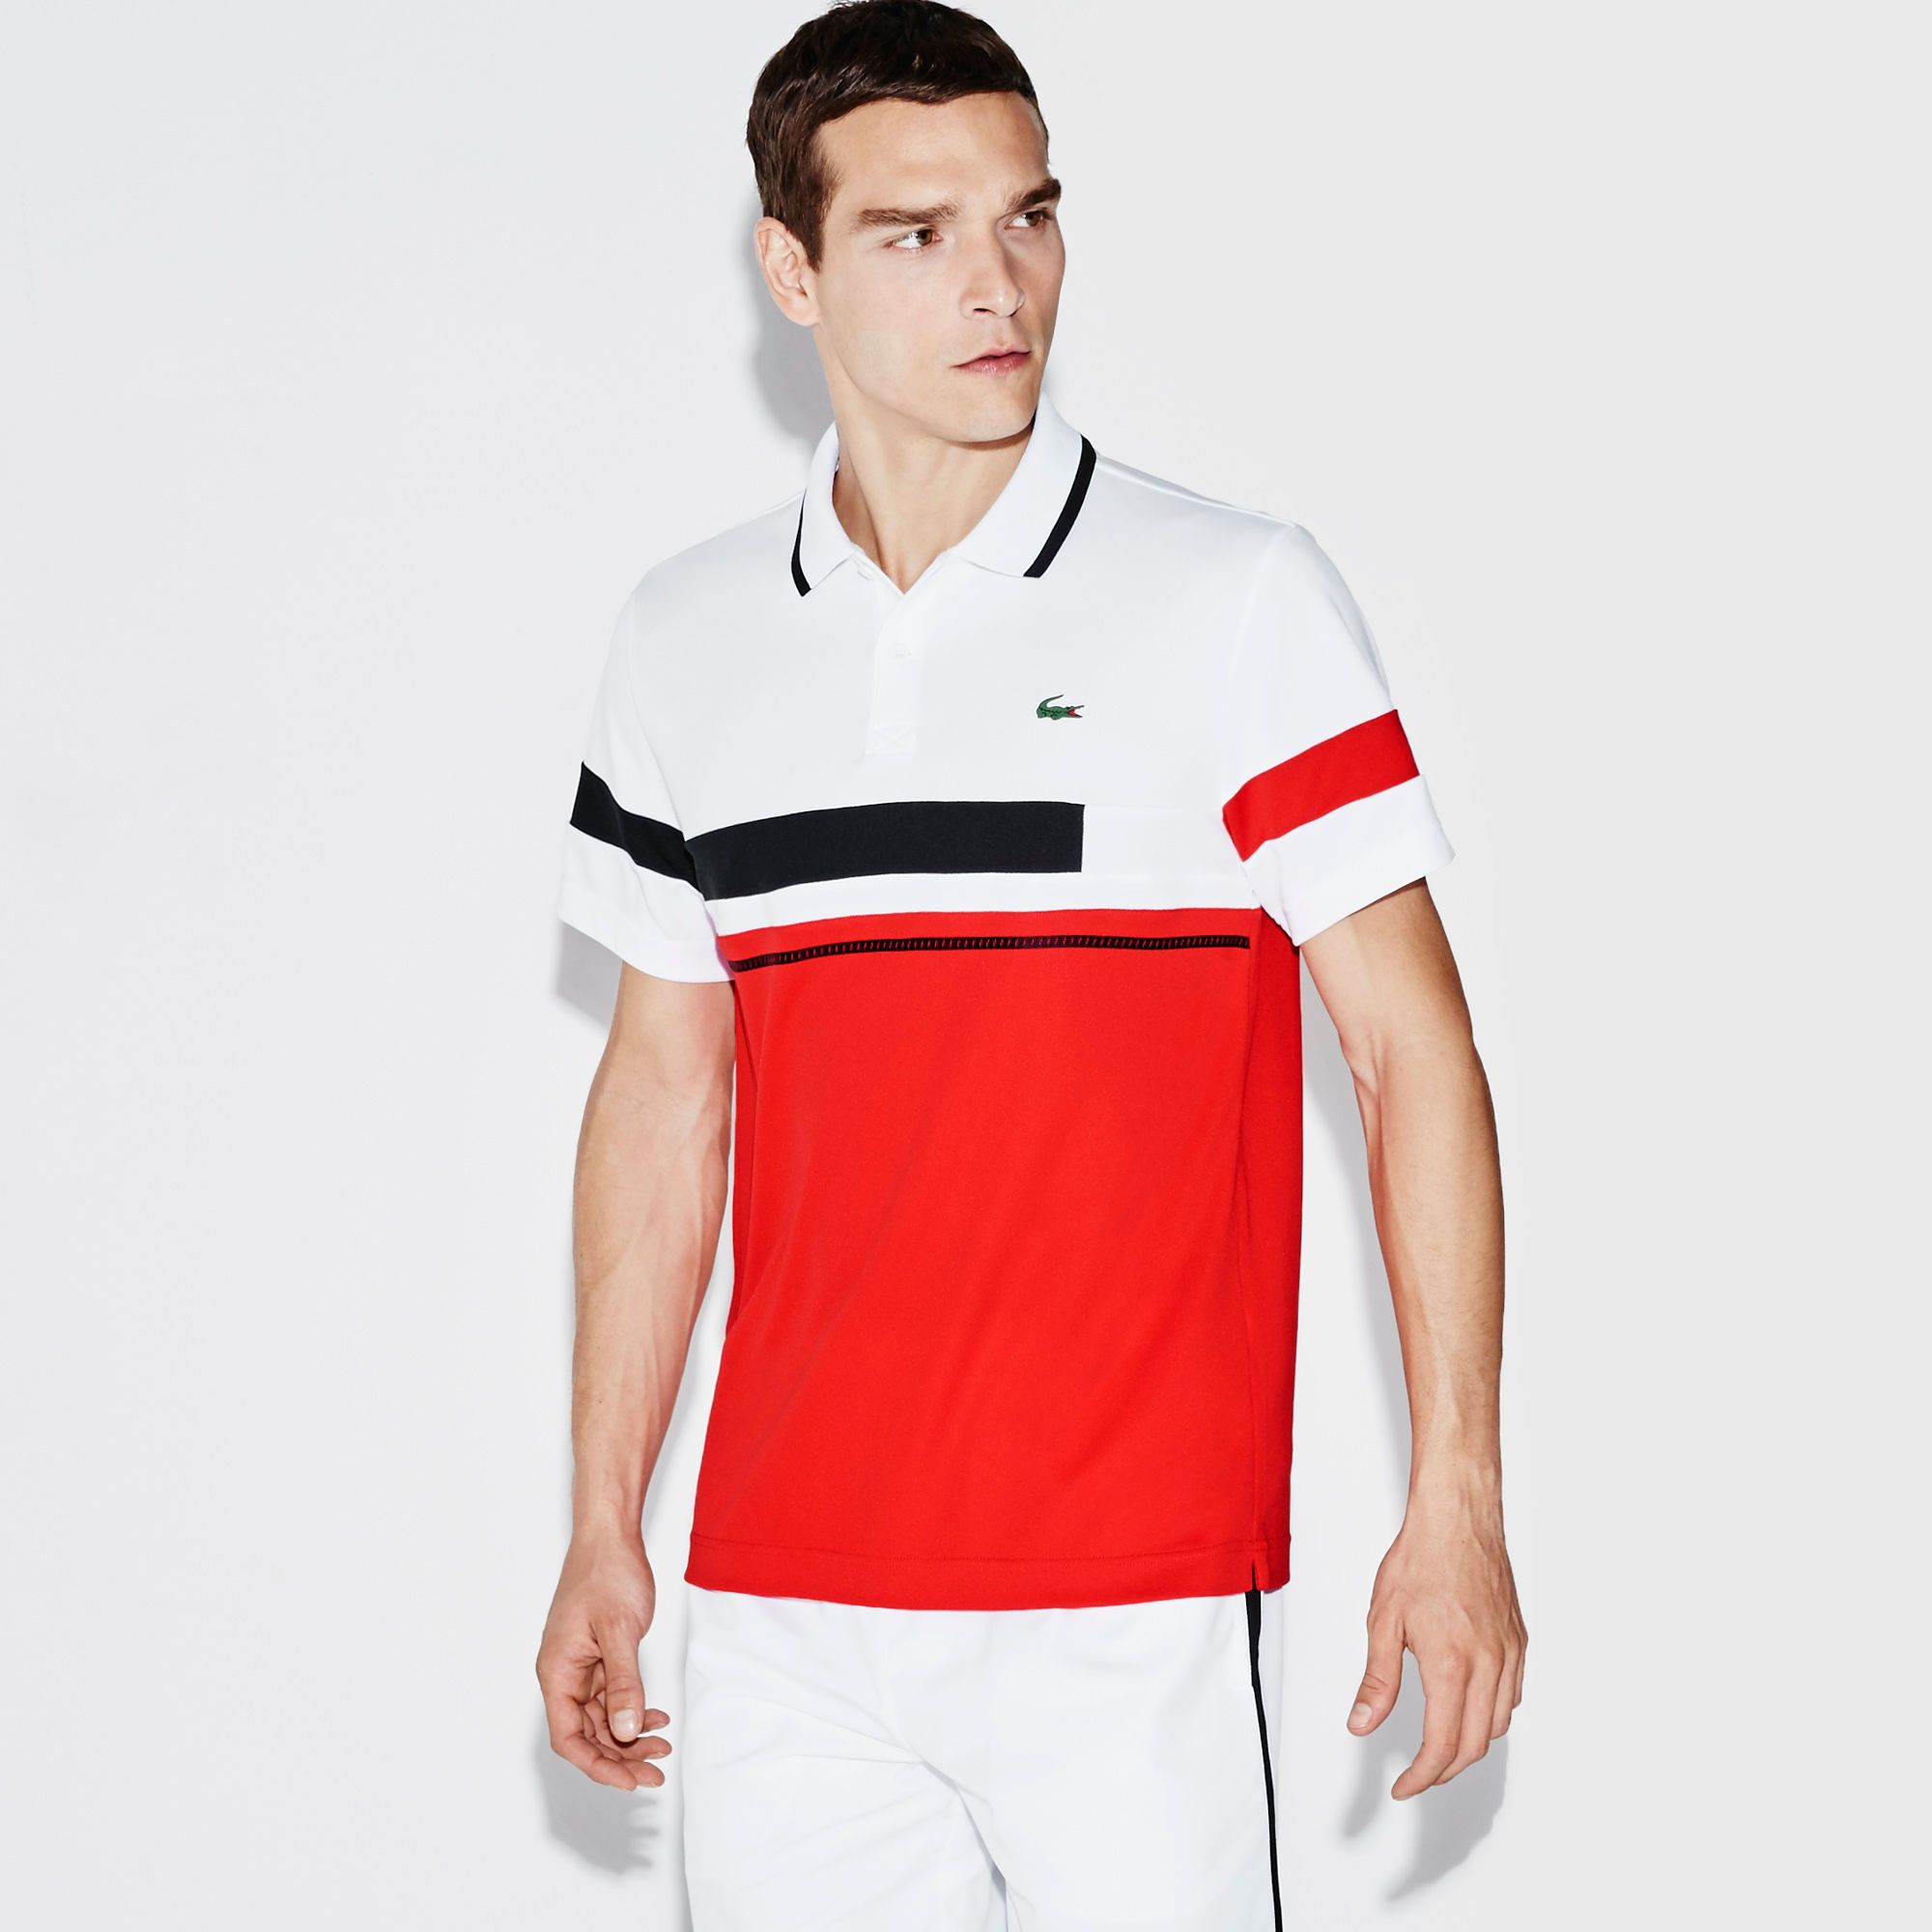 Men S Sport Ultra Dry Color Block Tennis Polo Lacoste Polo Shirt Design Shirts Polo T Shirts